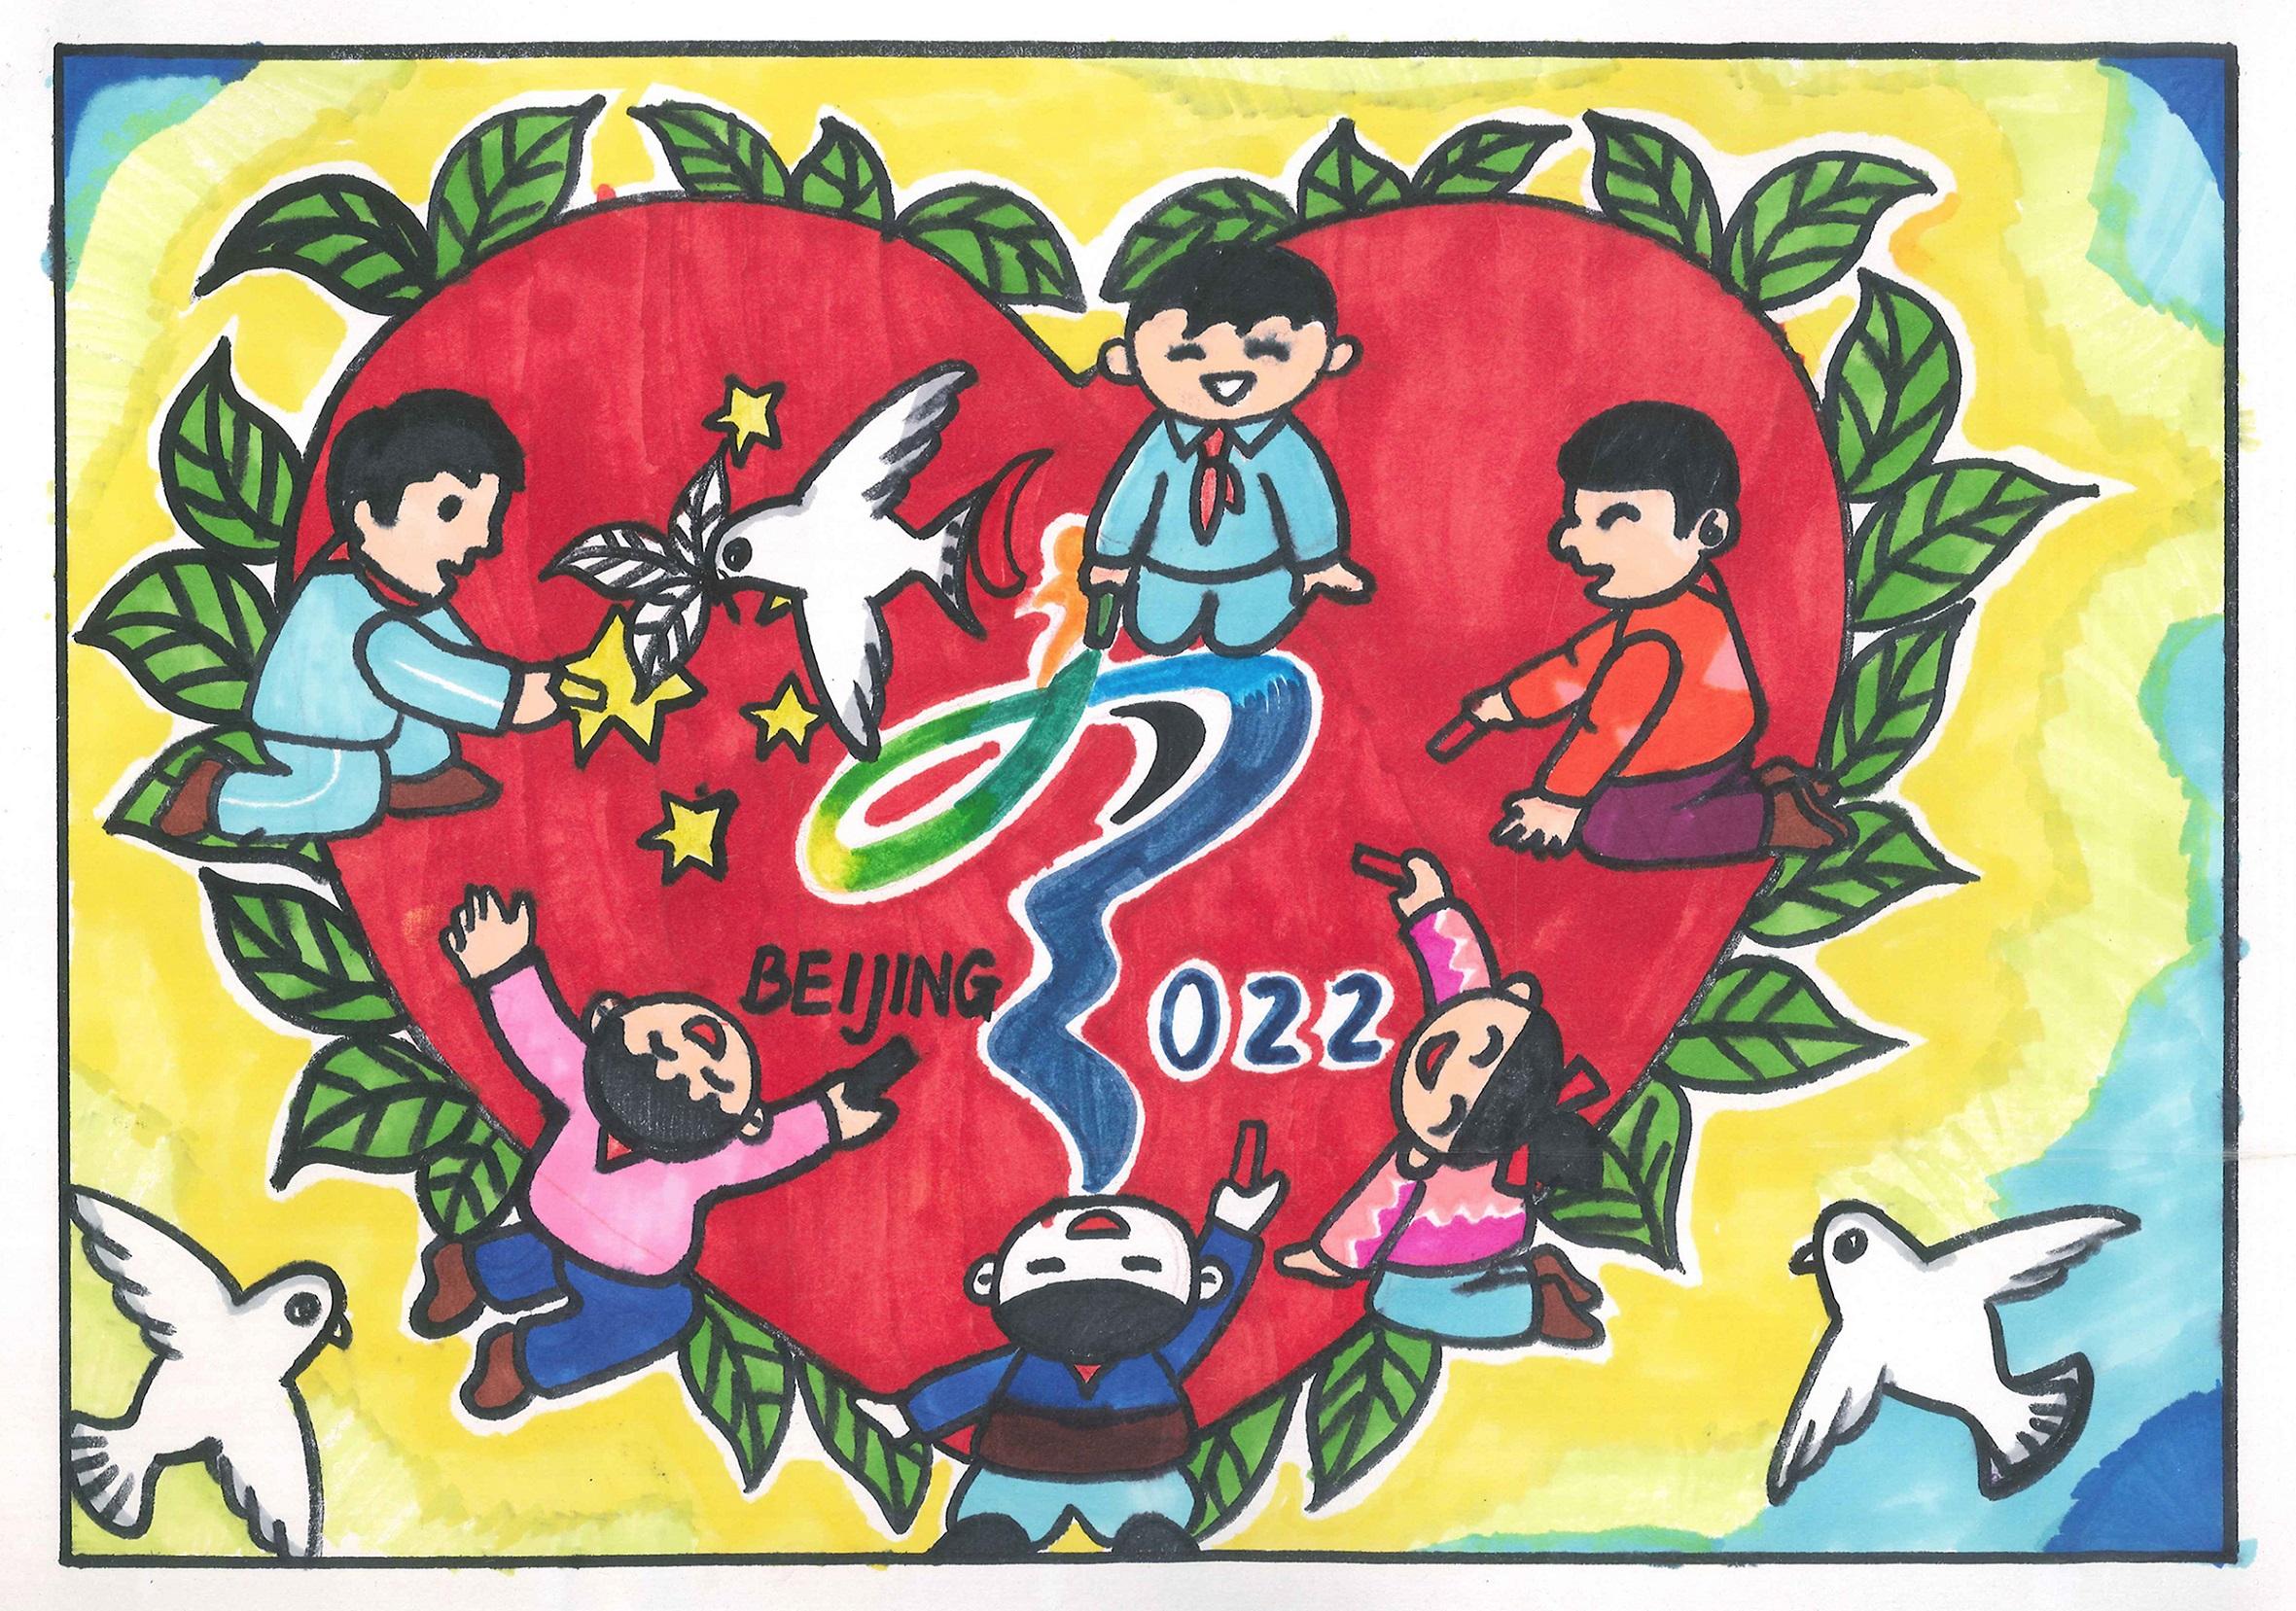 画出心中的冬奥 Draw The Winter Olympics In My Heart+姚旭 Yao Xu